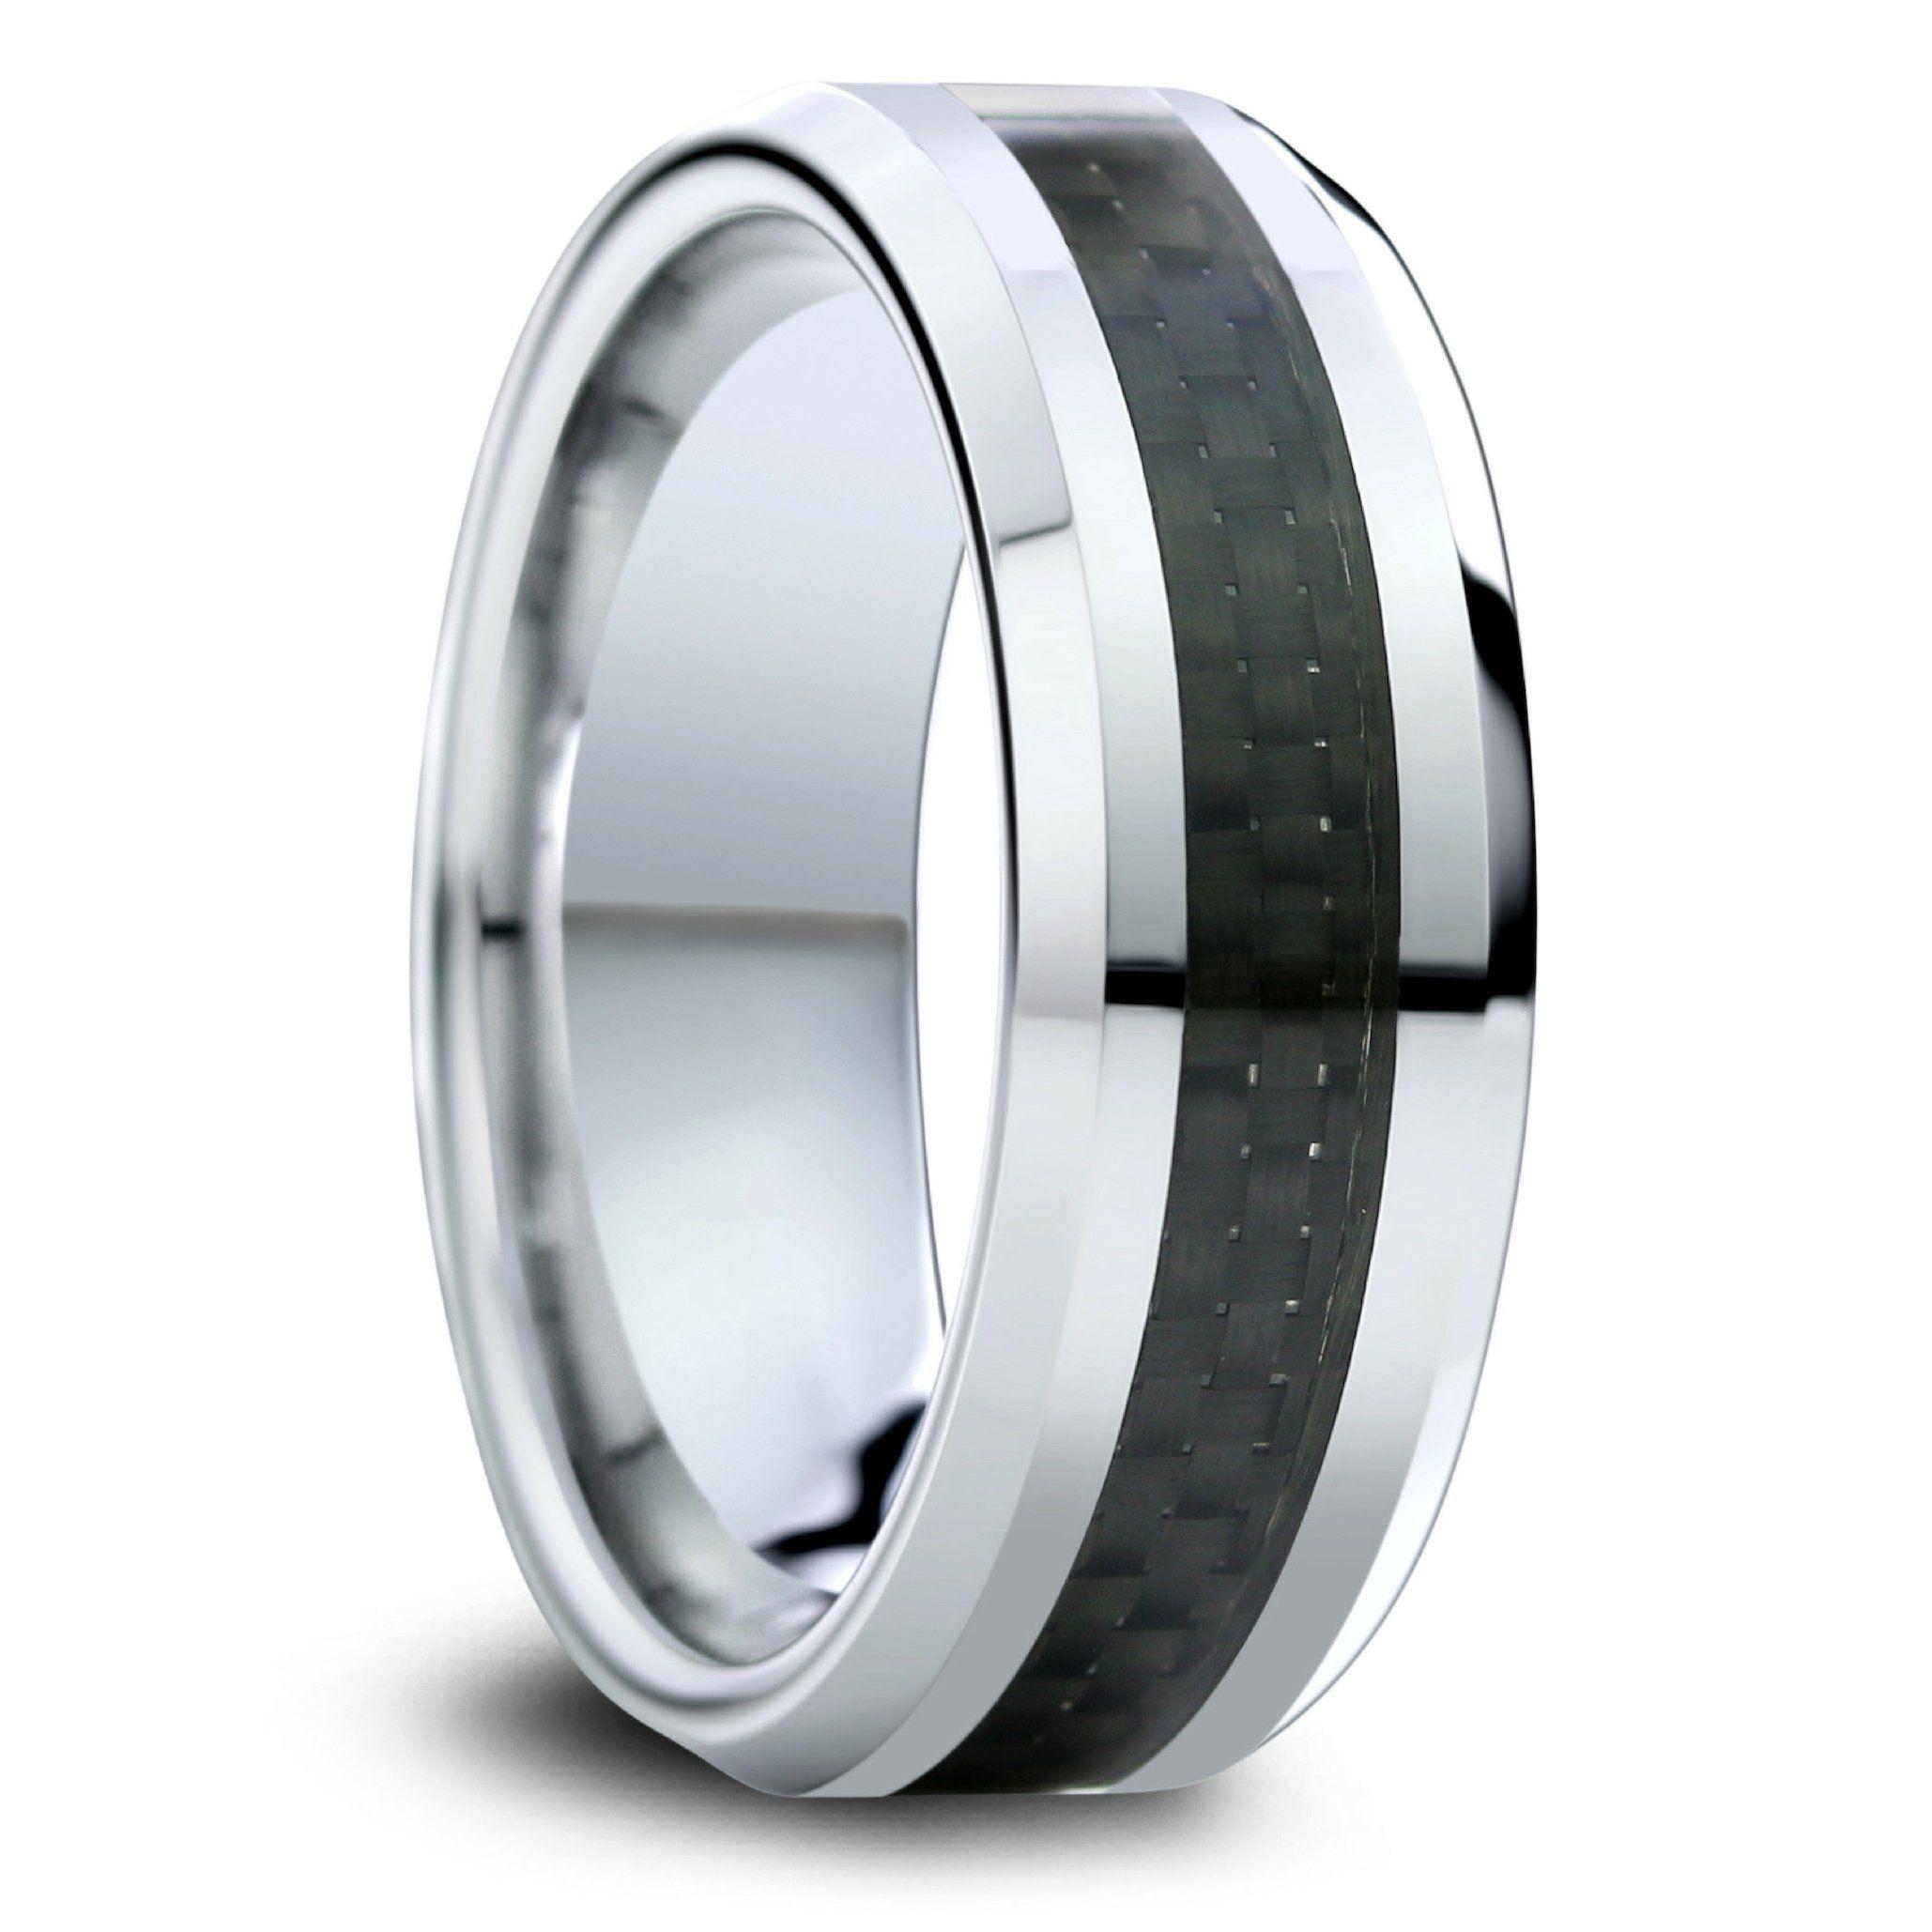 Mens Tungsten Wedding Band With Black Carbon Fiber Inlay